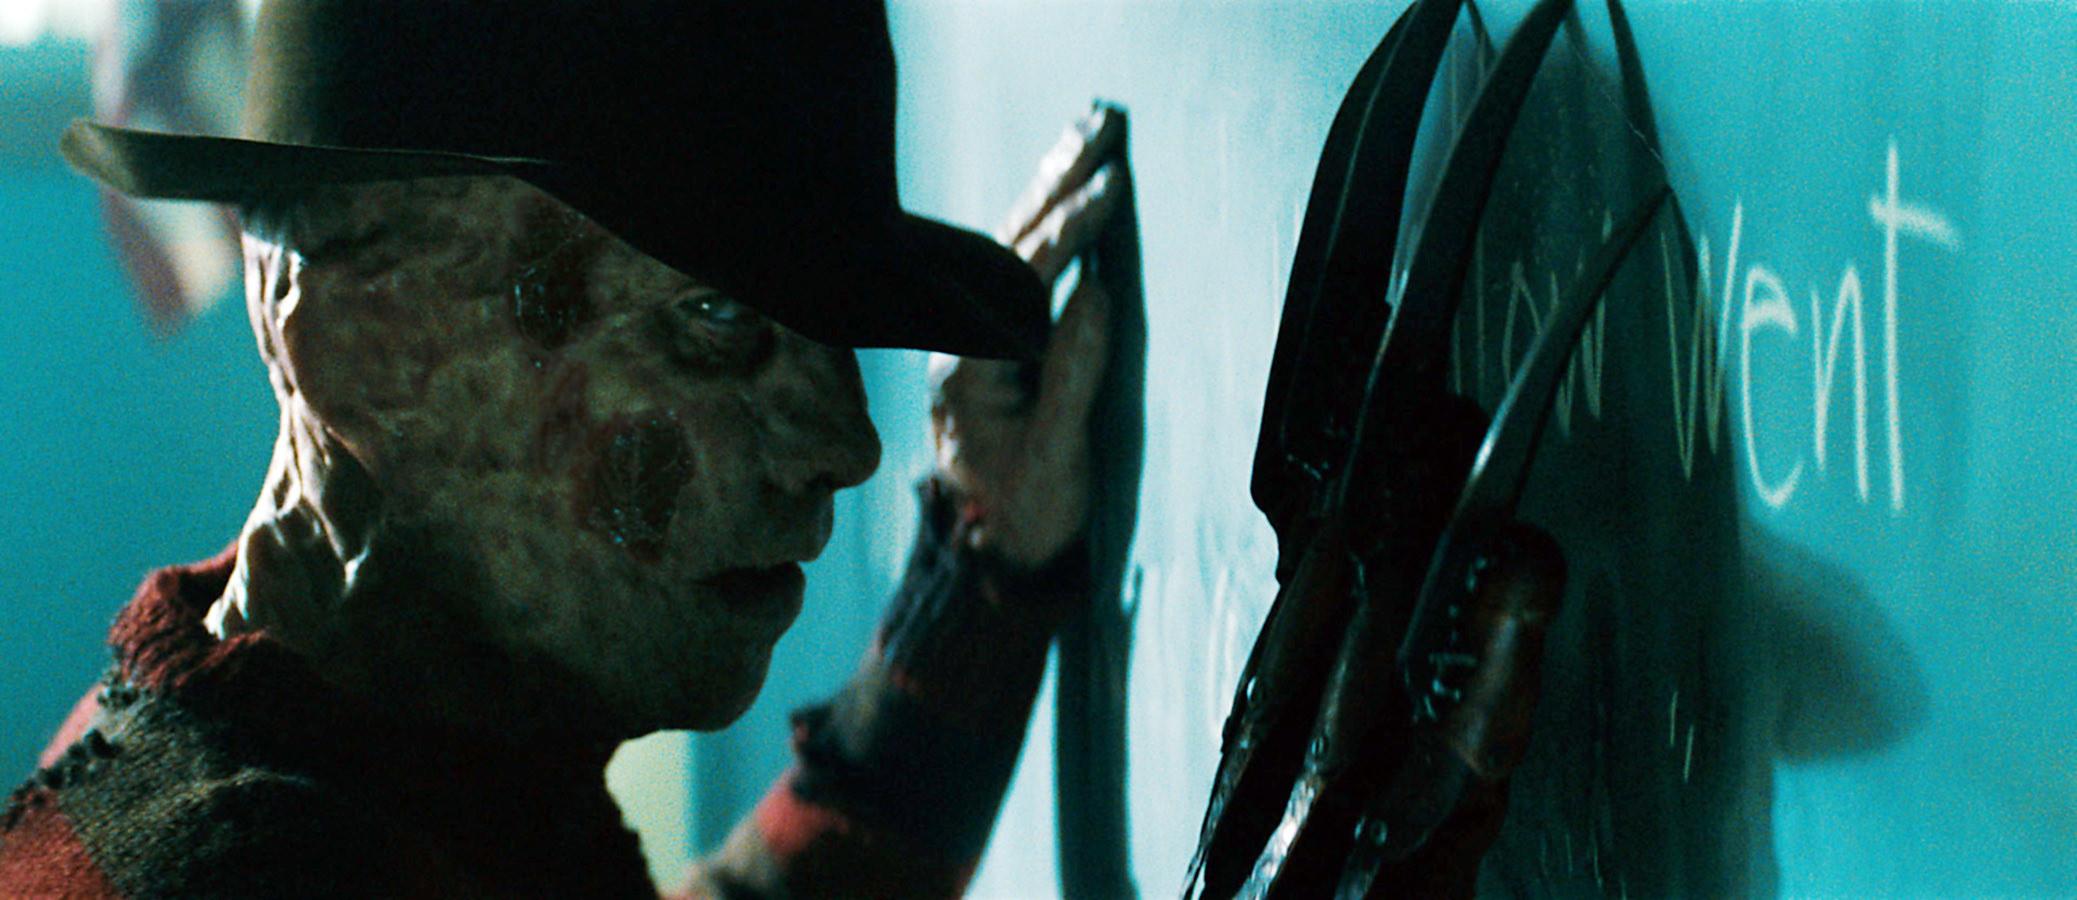 Freddie Krueger in the film against a chalkboard